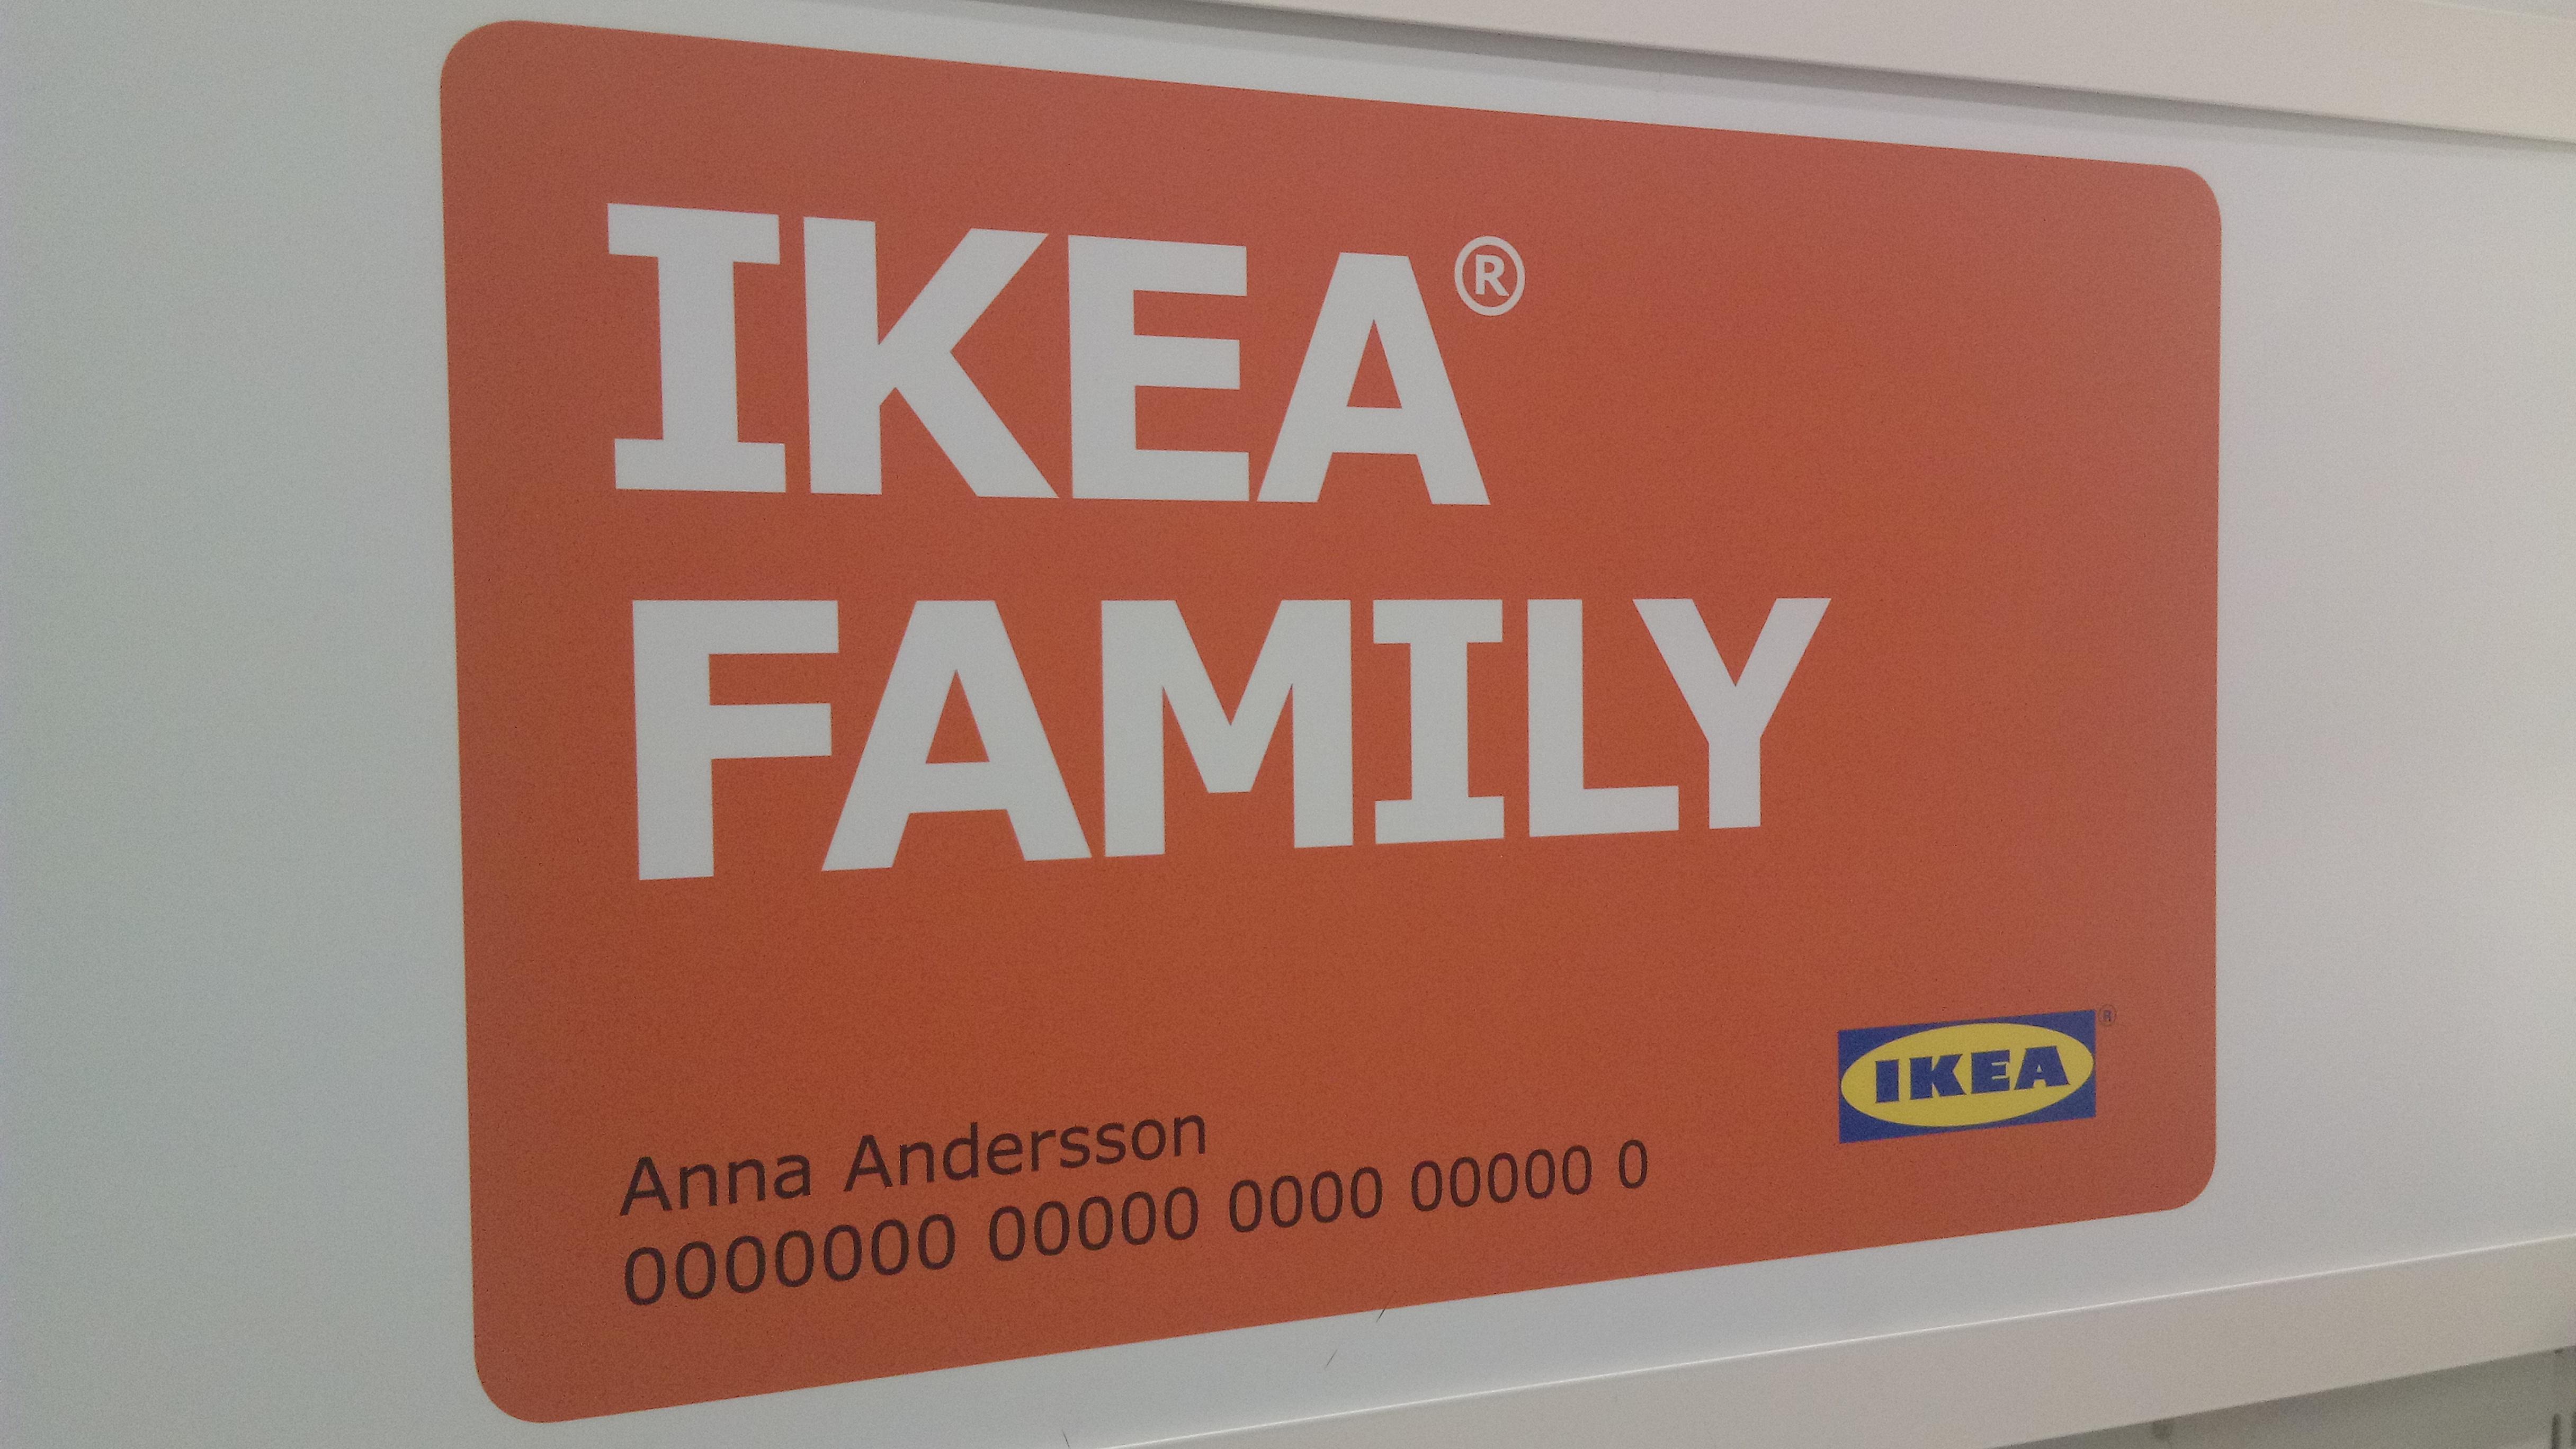 Fileikea Family Card Sign Ikea Groningen 2019jpg Wikimedia